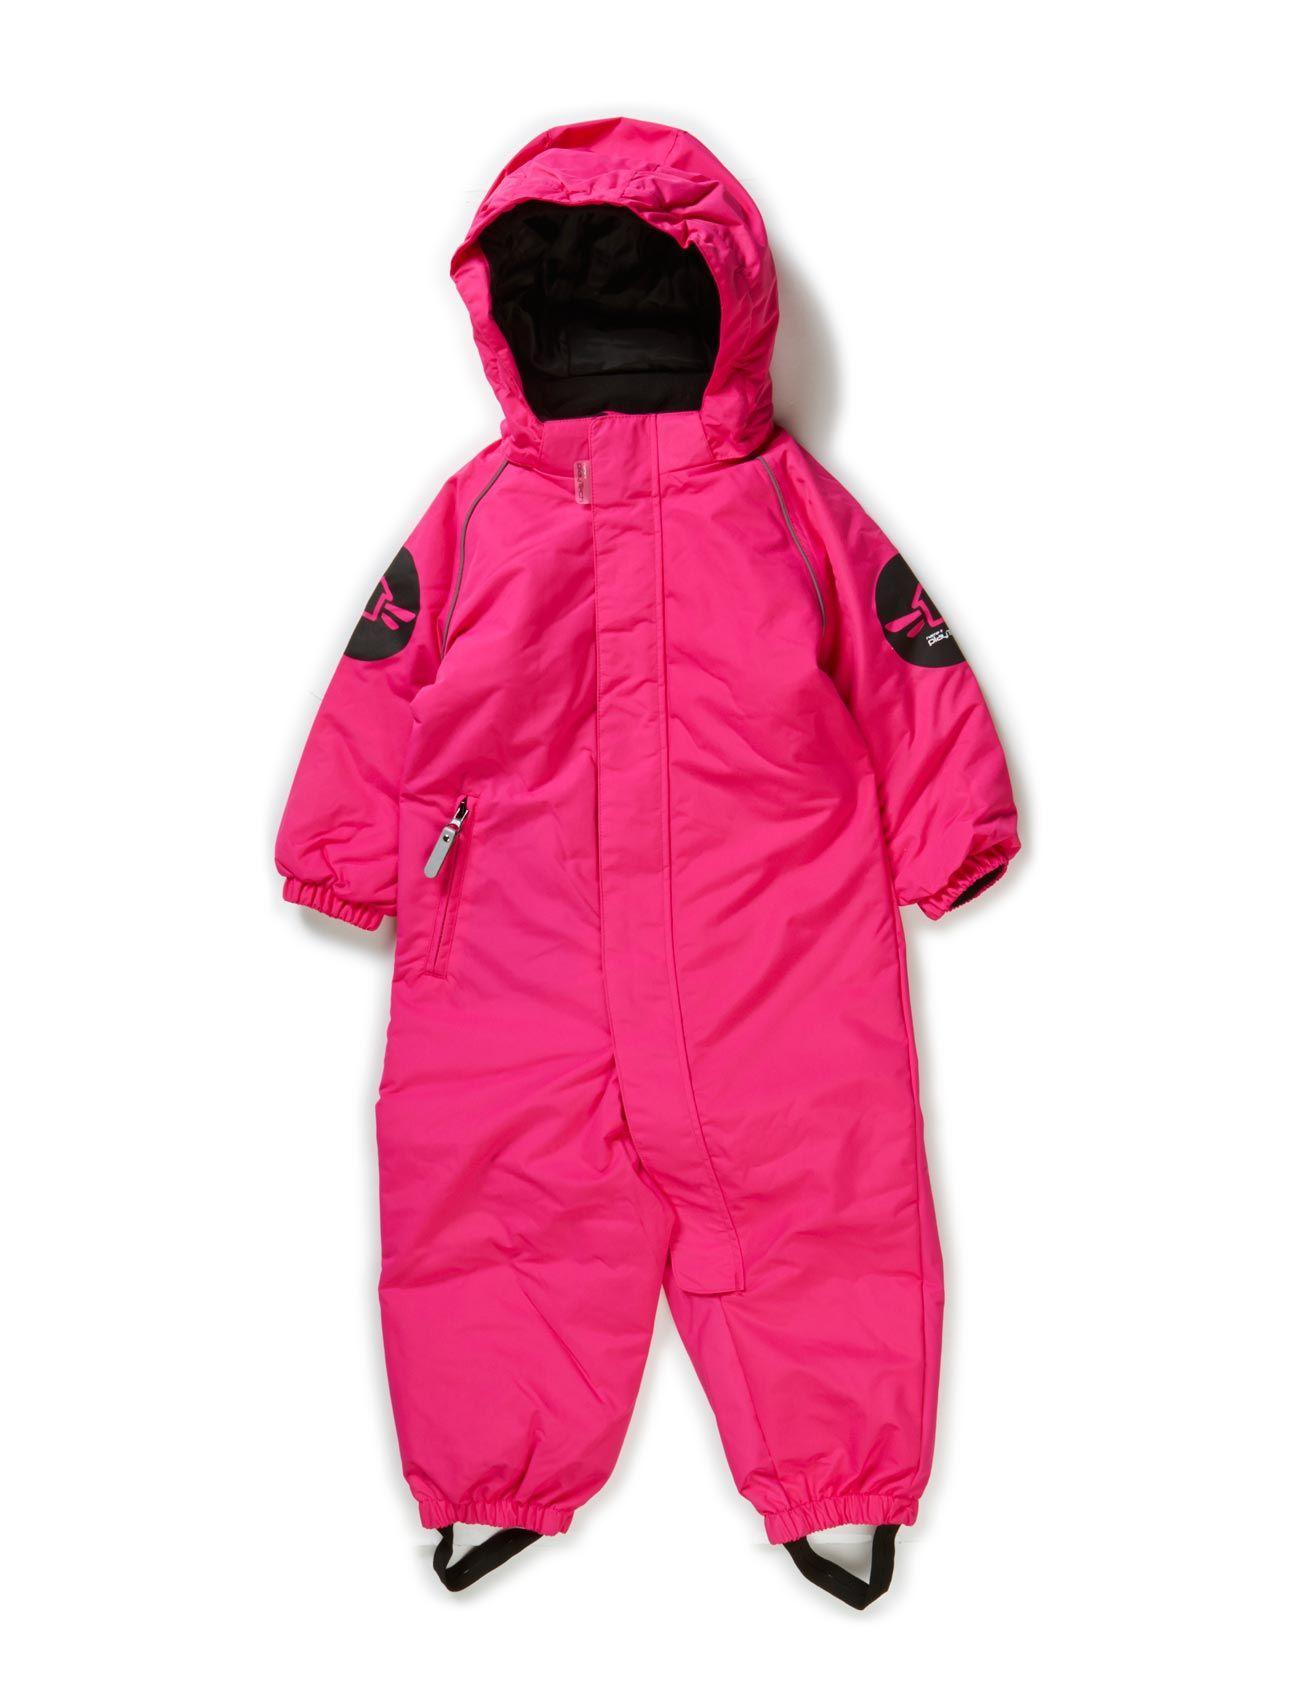 Wind Mini Snowsuit Pink Glo Fo 314